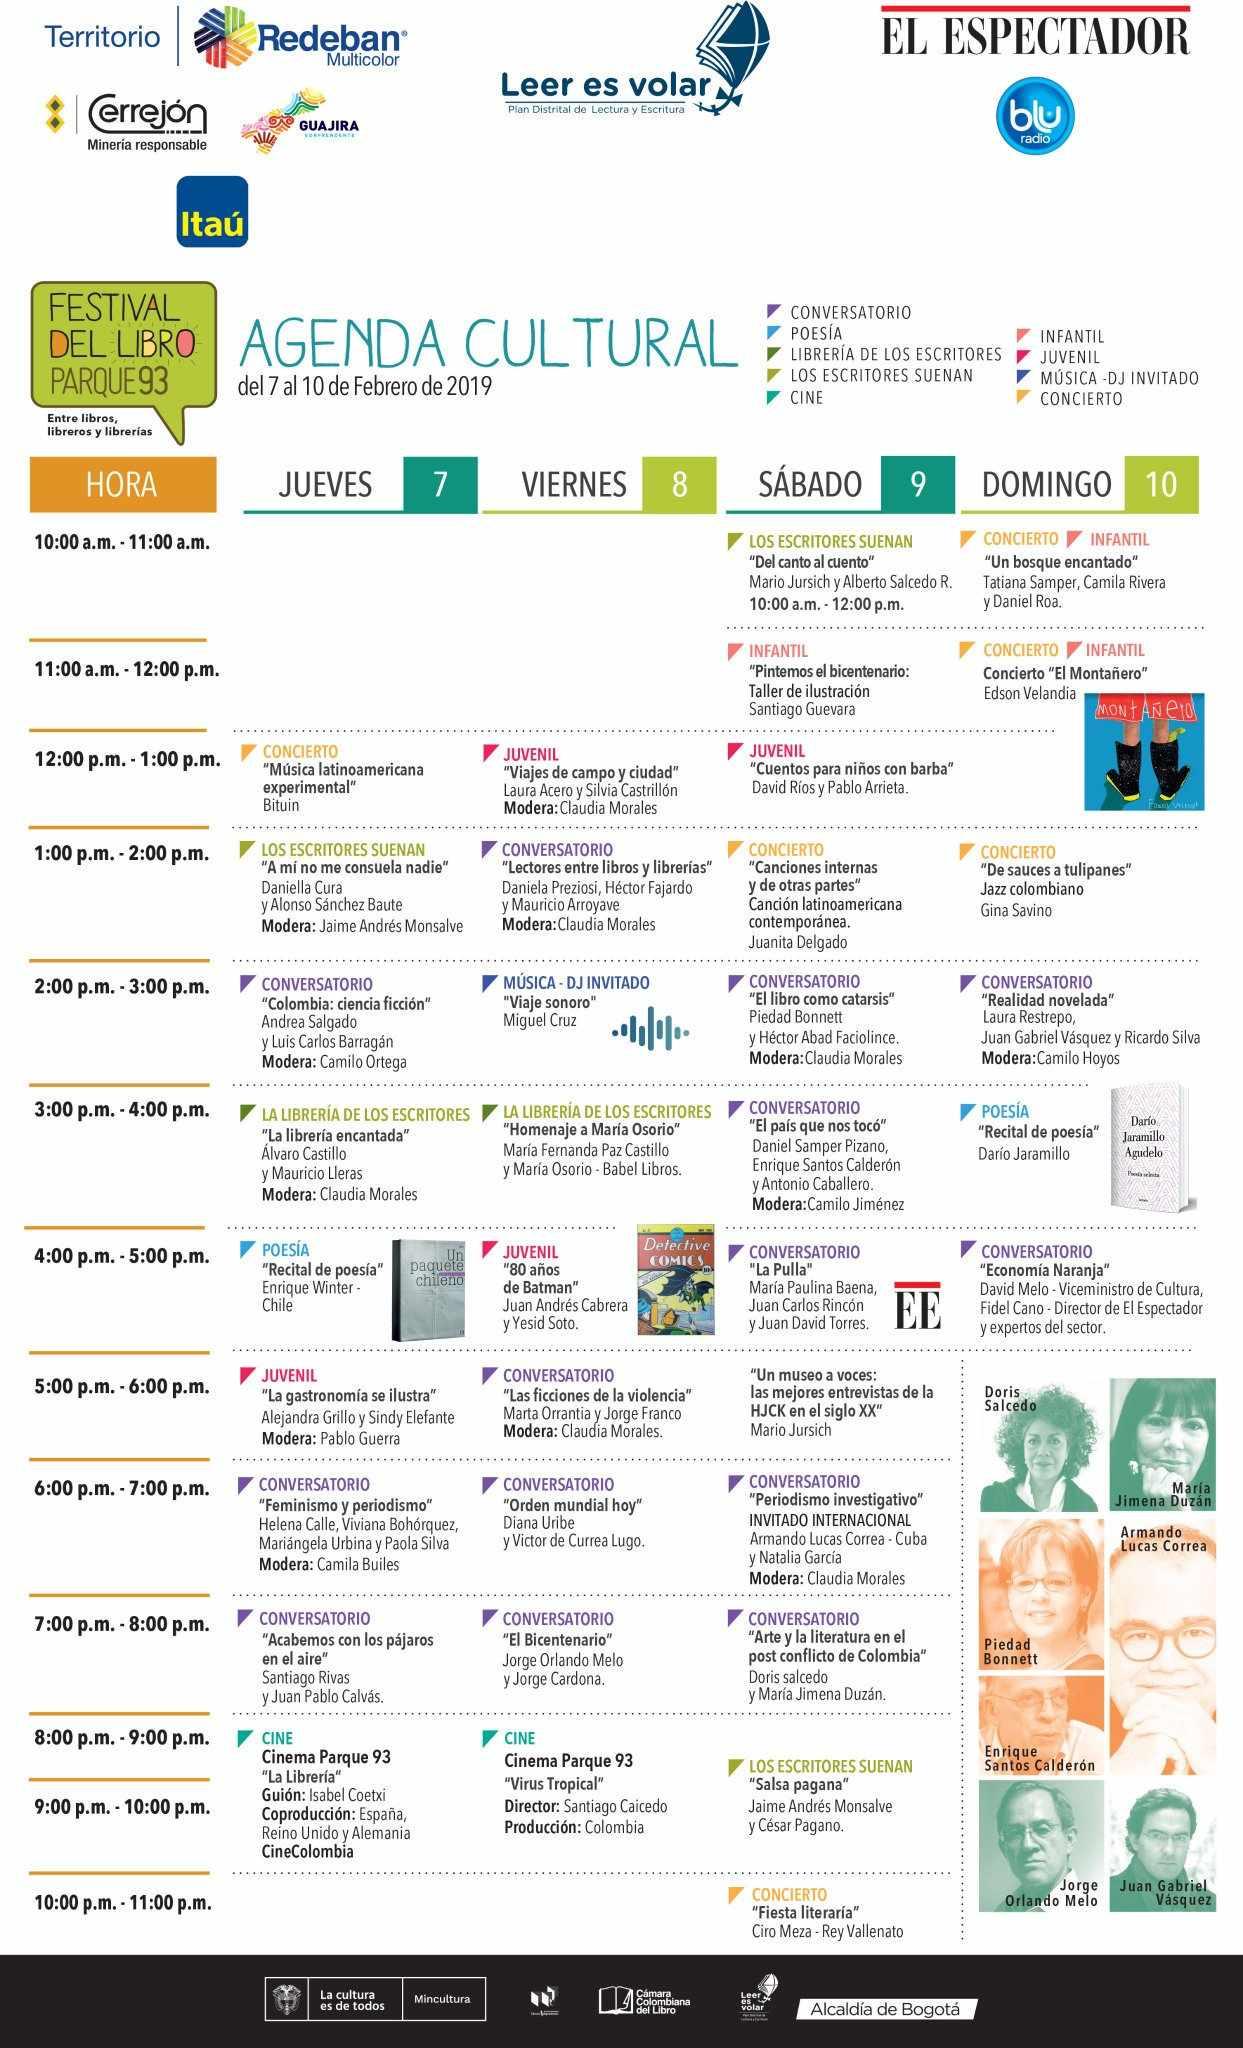 Agenda Cultural Festival del Libro - Parque 93